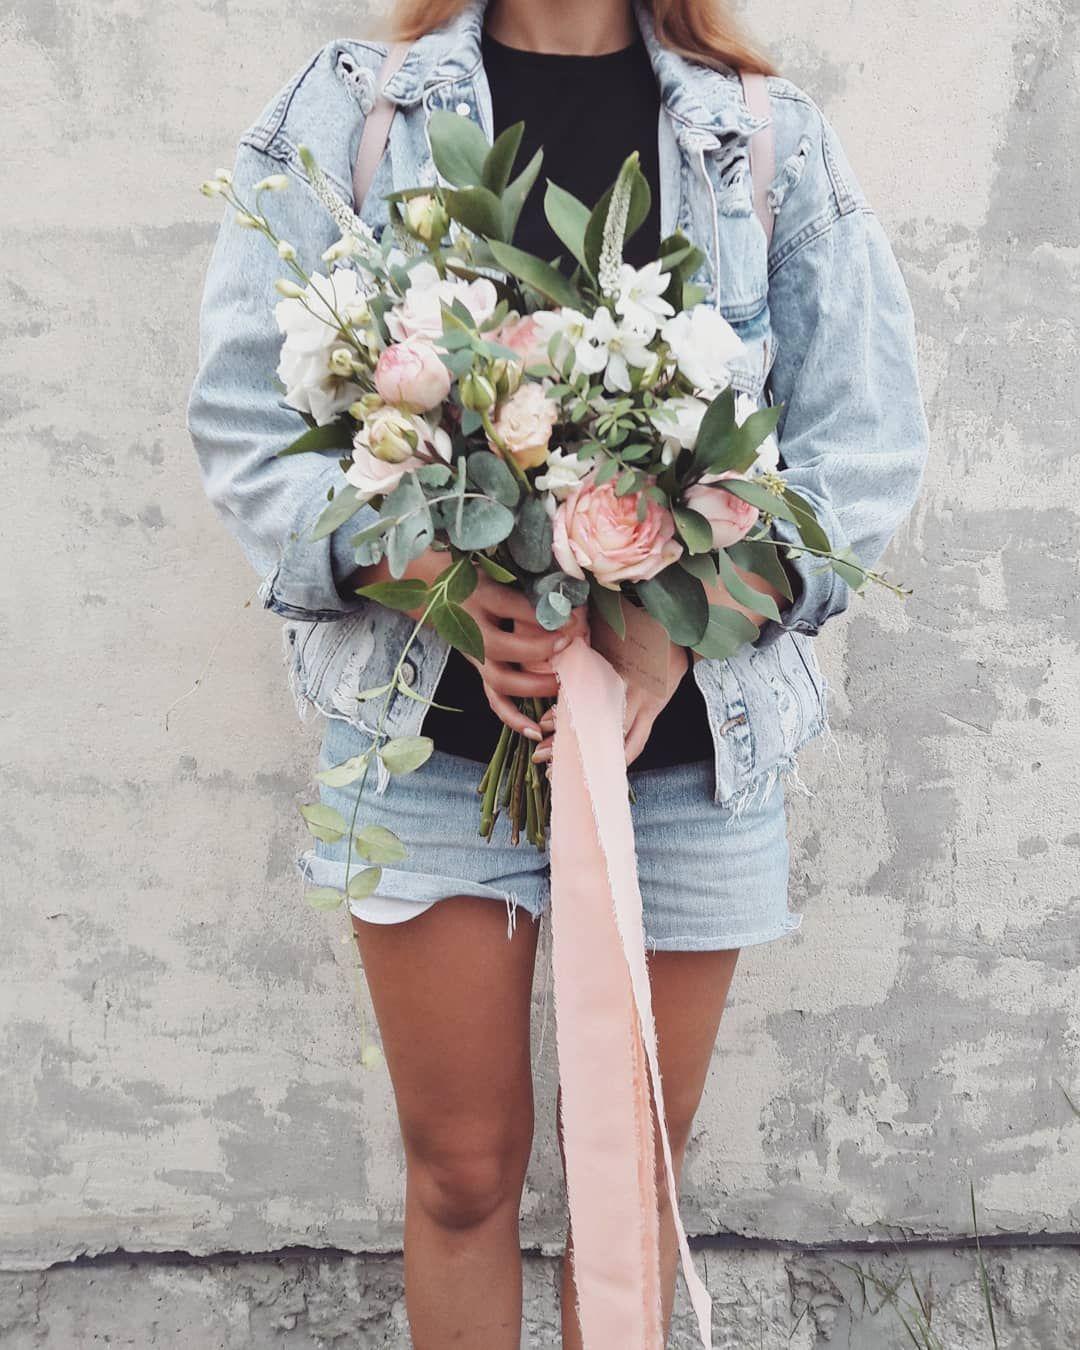 Sierpniowy Bukiet Slubny Wedding Bouquets Fashion Women